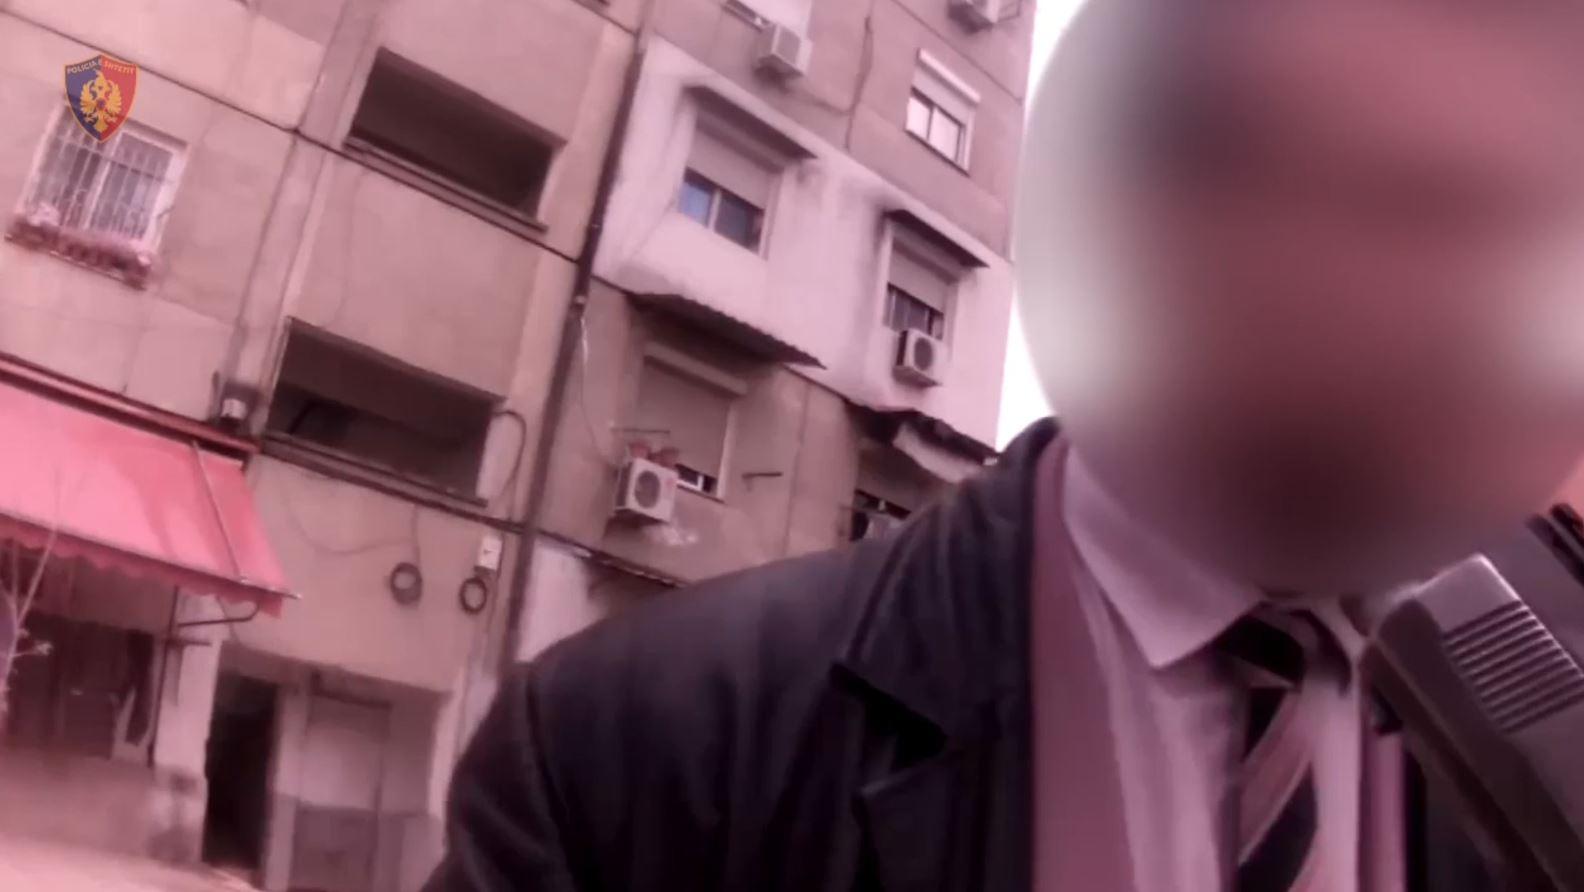 Prezantohet si agjent i policie, pranga mashtruesit